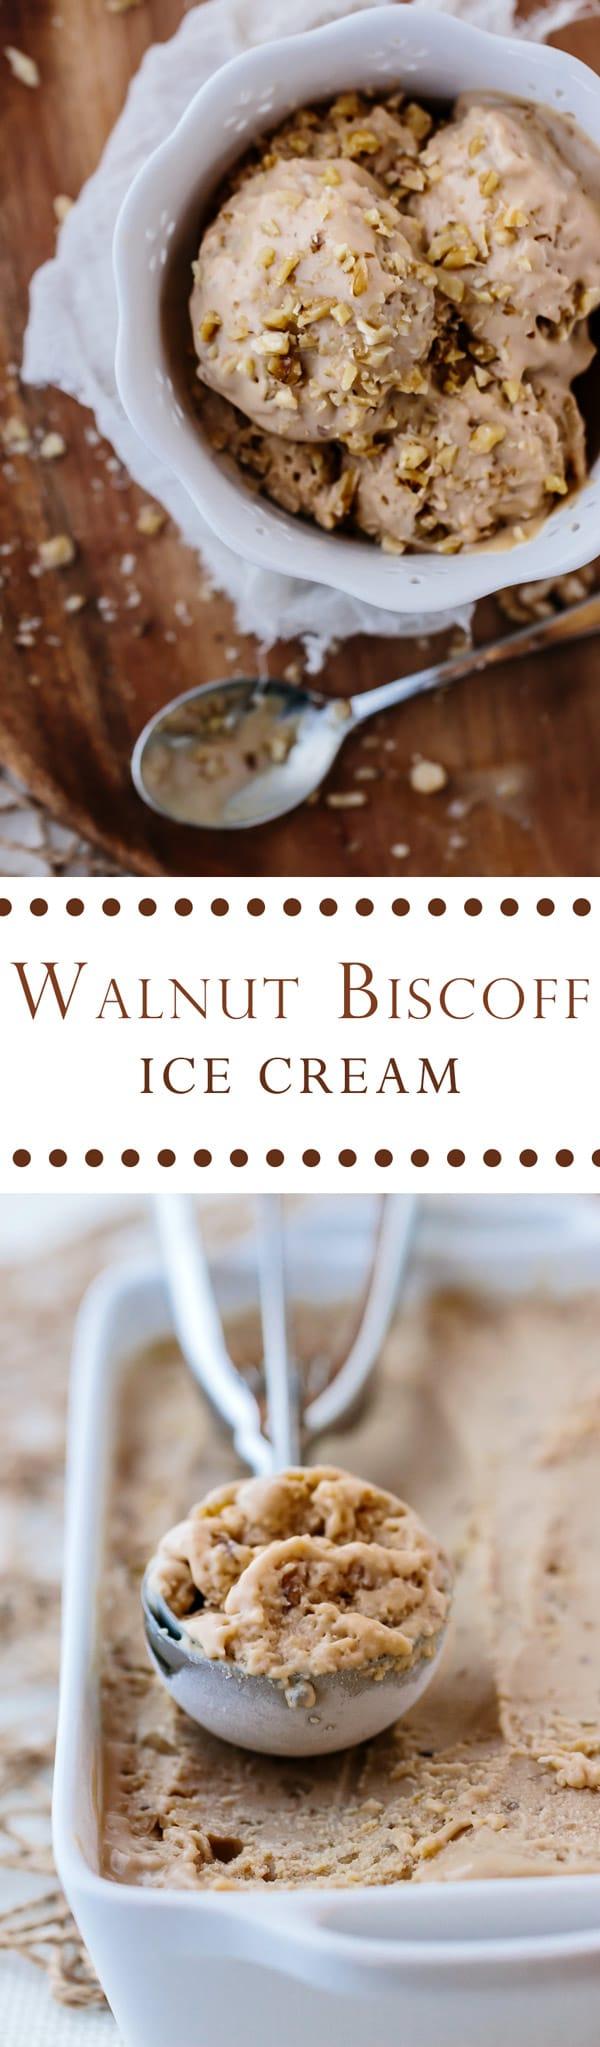 Biscoff Walnut Ice Cream